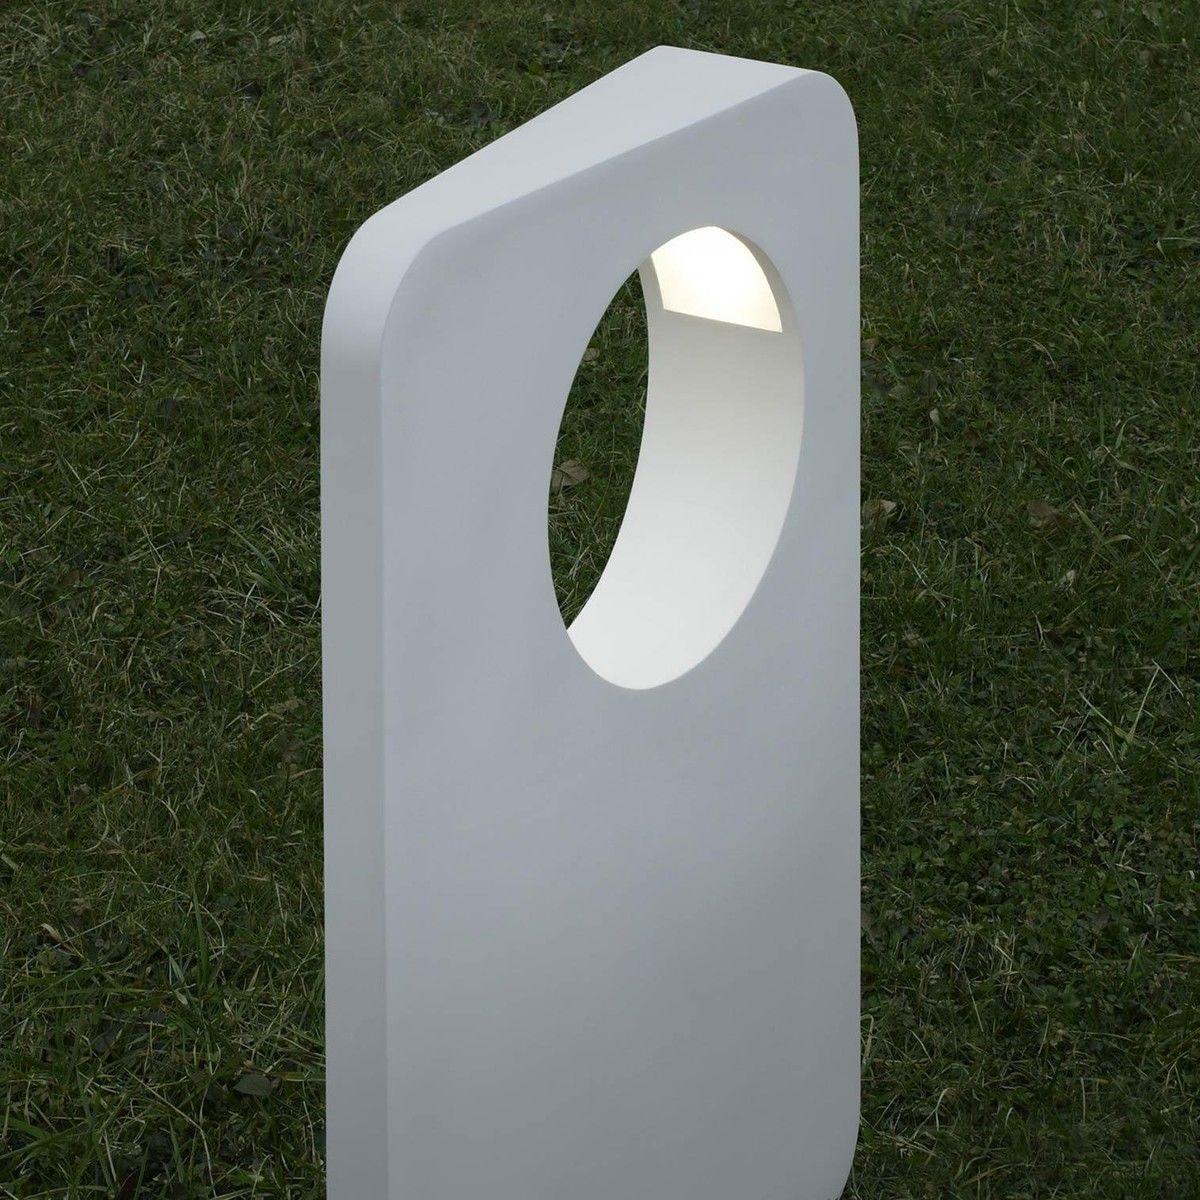 eraclea outdoor led lampe de sol artemide. Black Bedroom Furniture Sets. Home Design Ideas